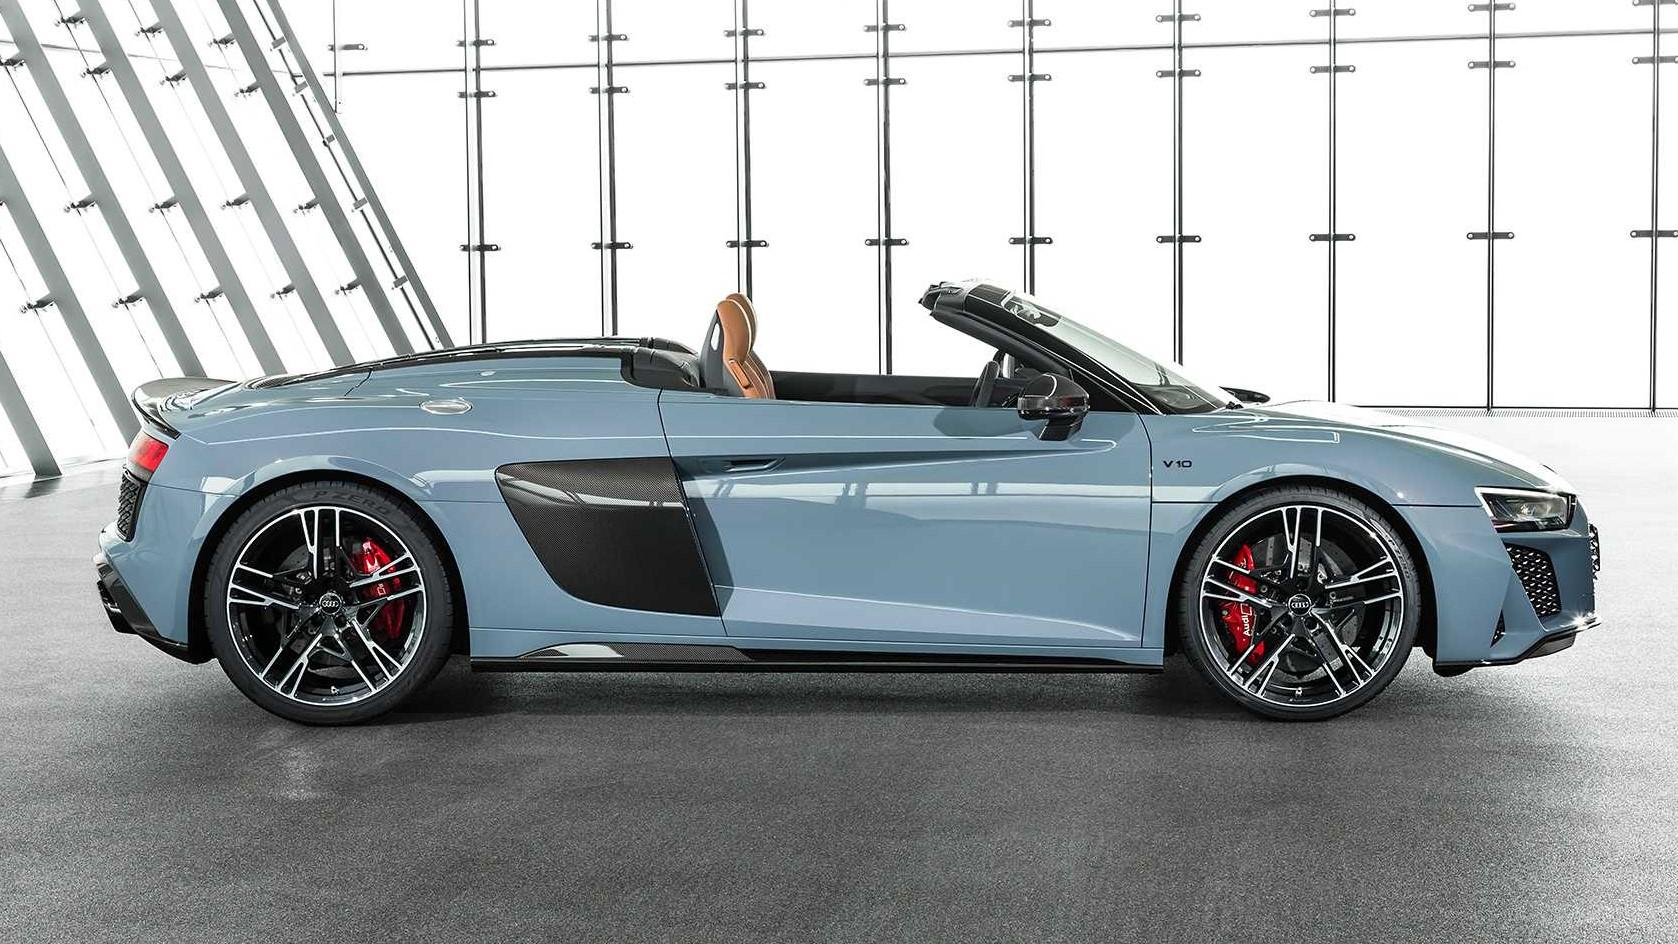 2019 Audi R8 Spyder side profile